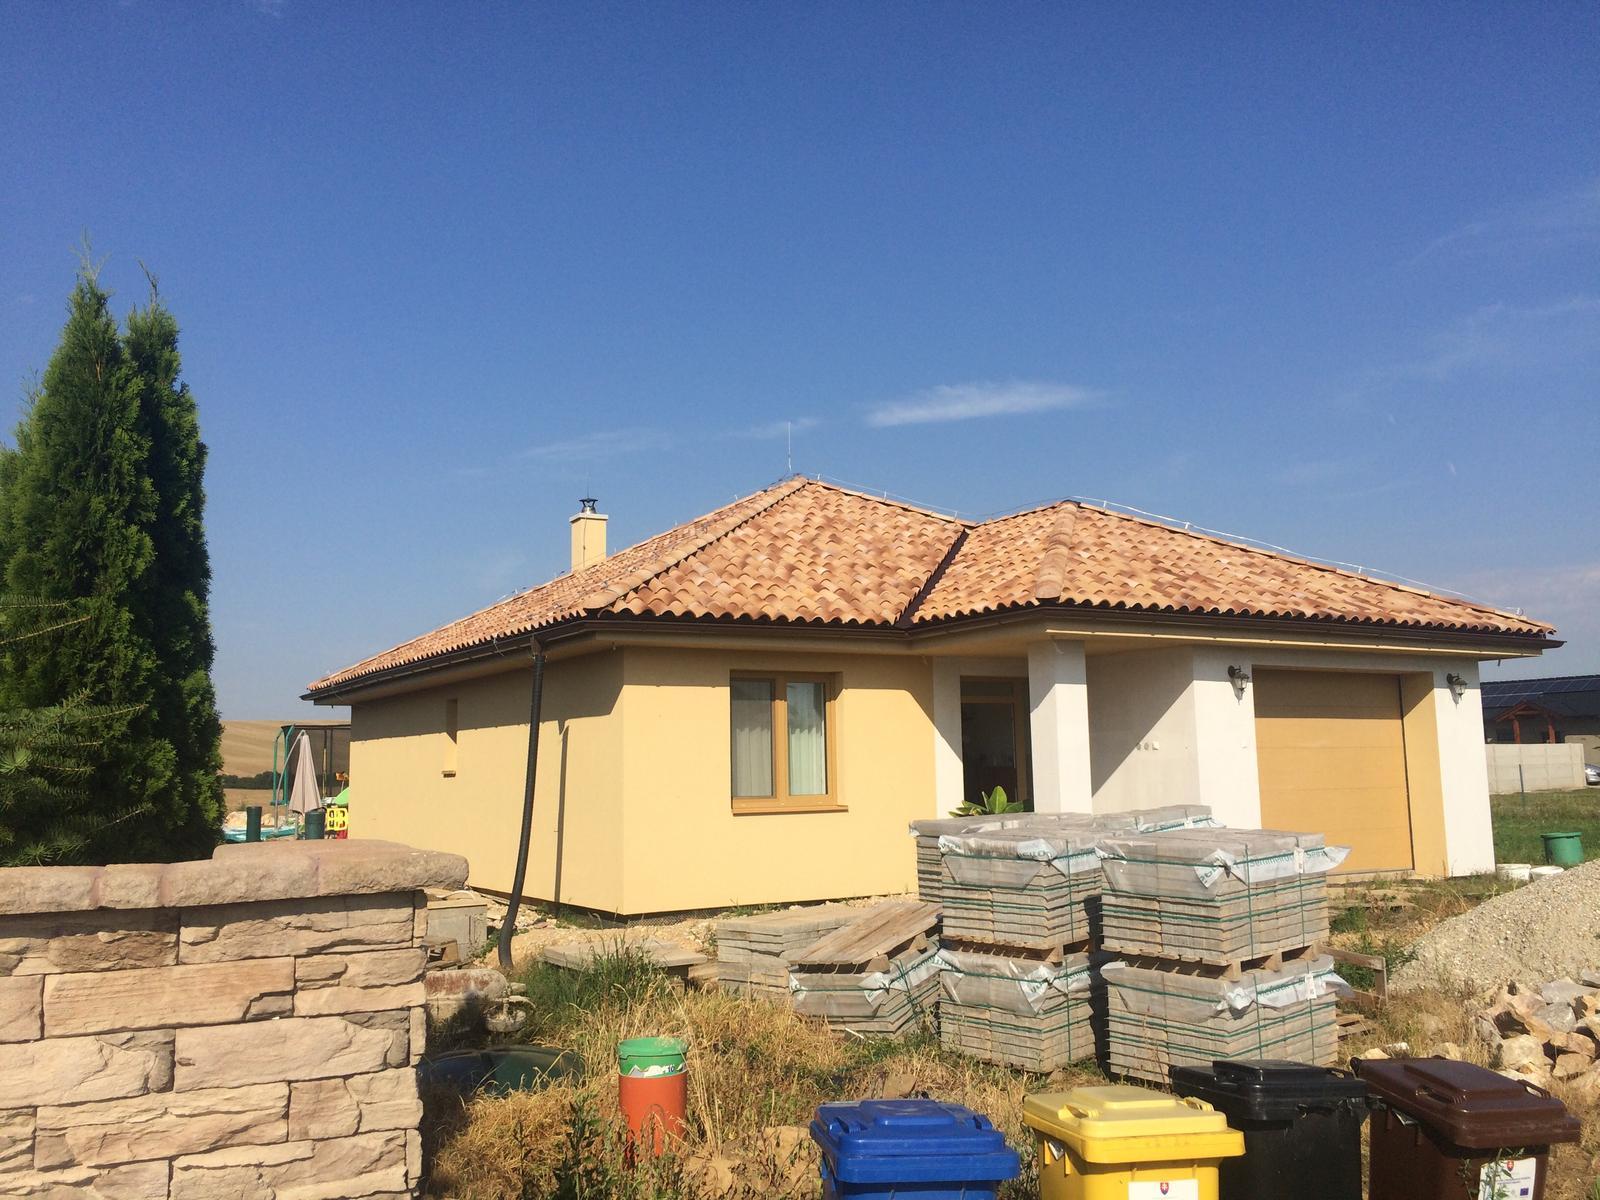 Talianska škridla 0911 166 254 - Obrázok č. 1